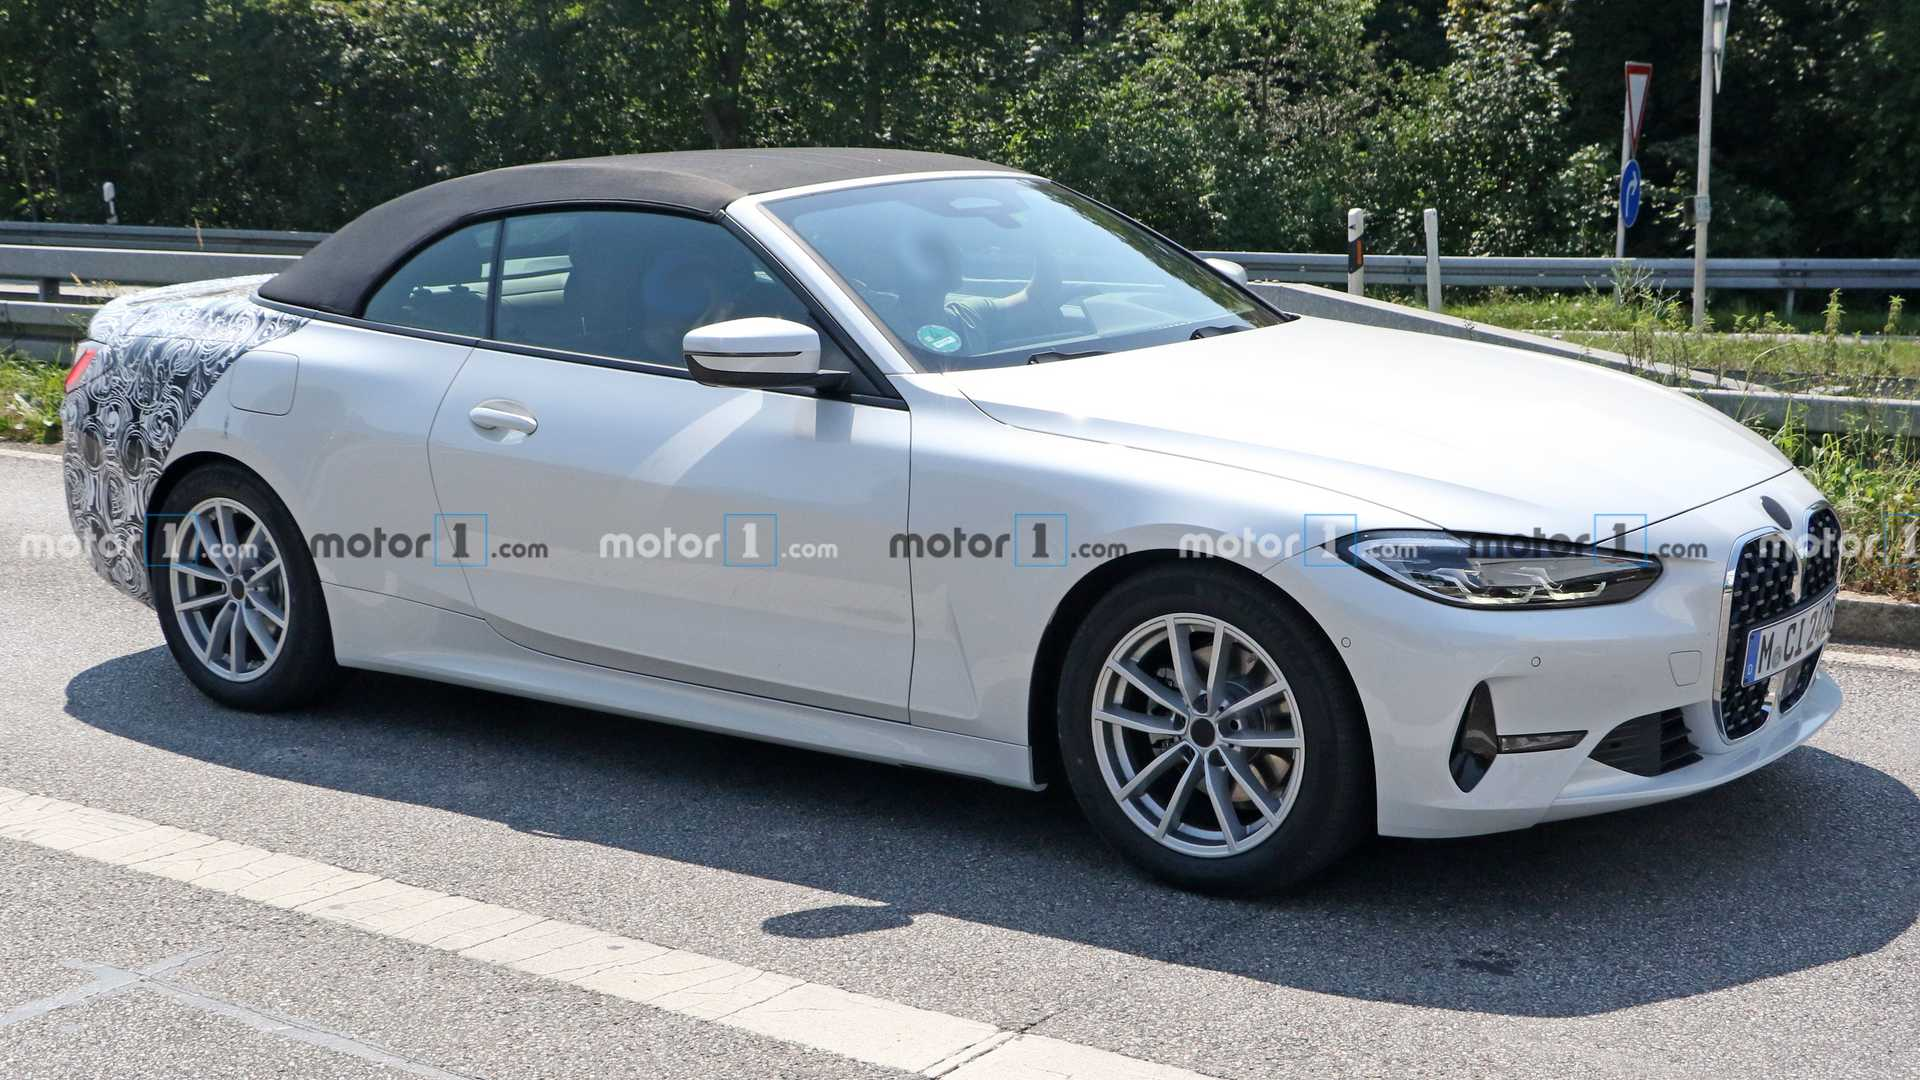 2020 - [BMW] Série 4 Coupé/Cabriolet G23-G22 - Page 16 New-bmw-4-series-convertible-front-profile